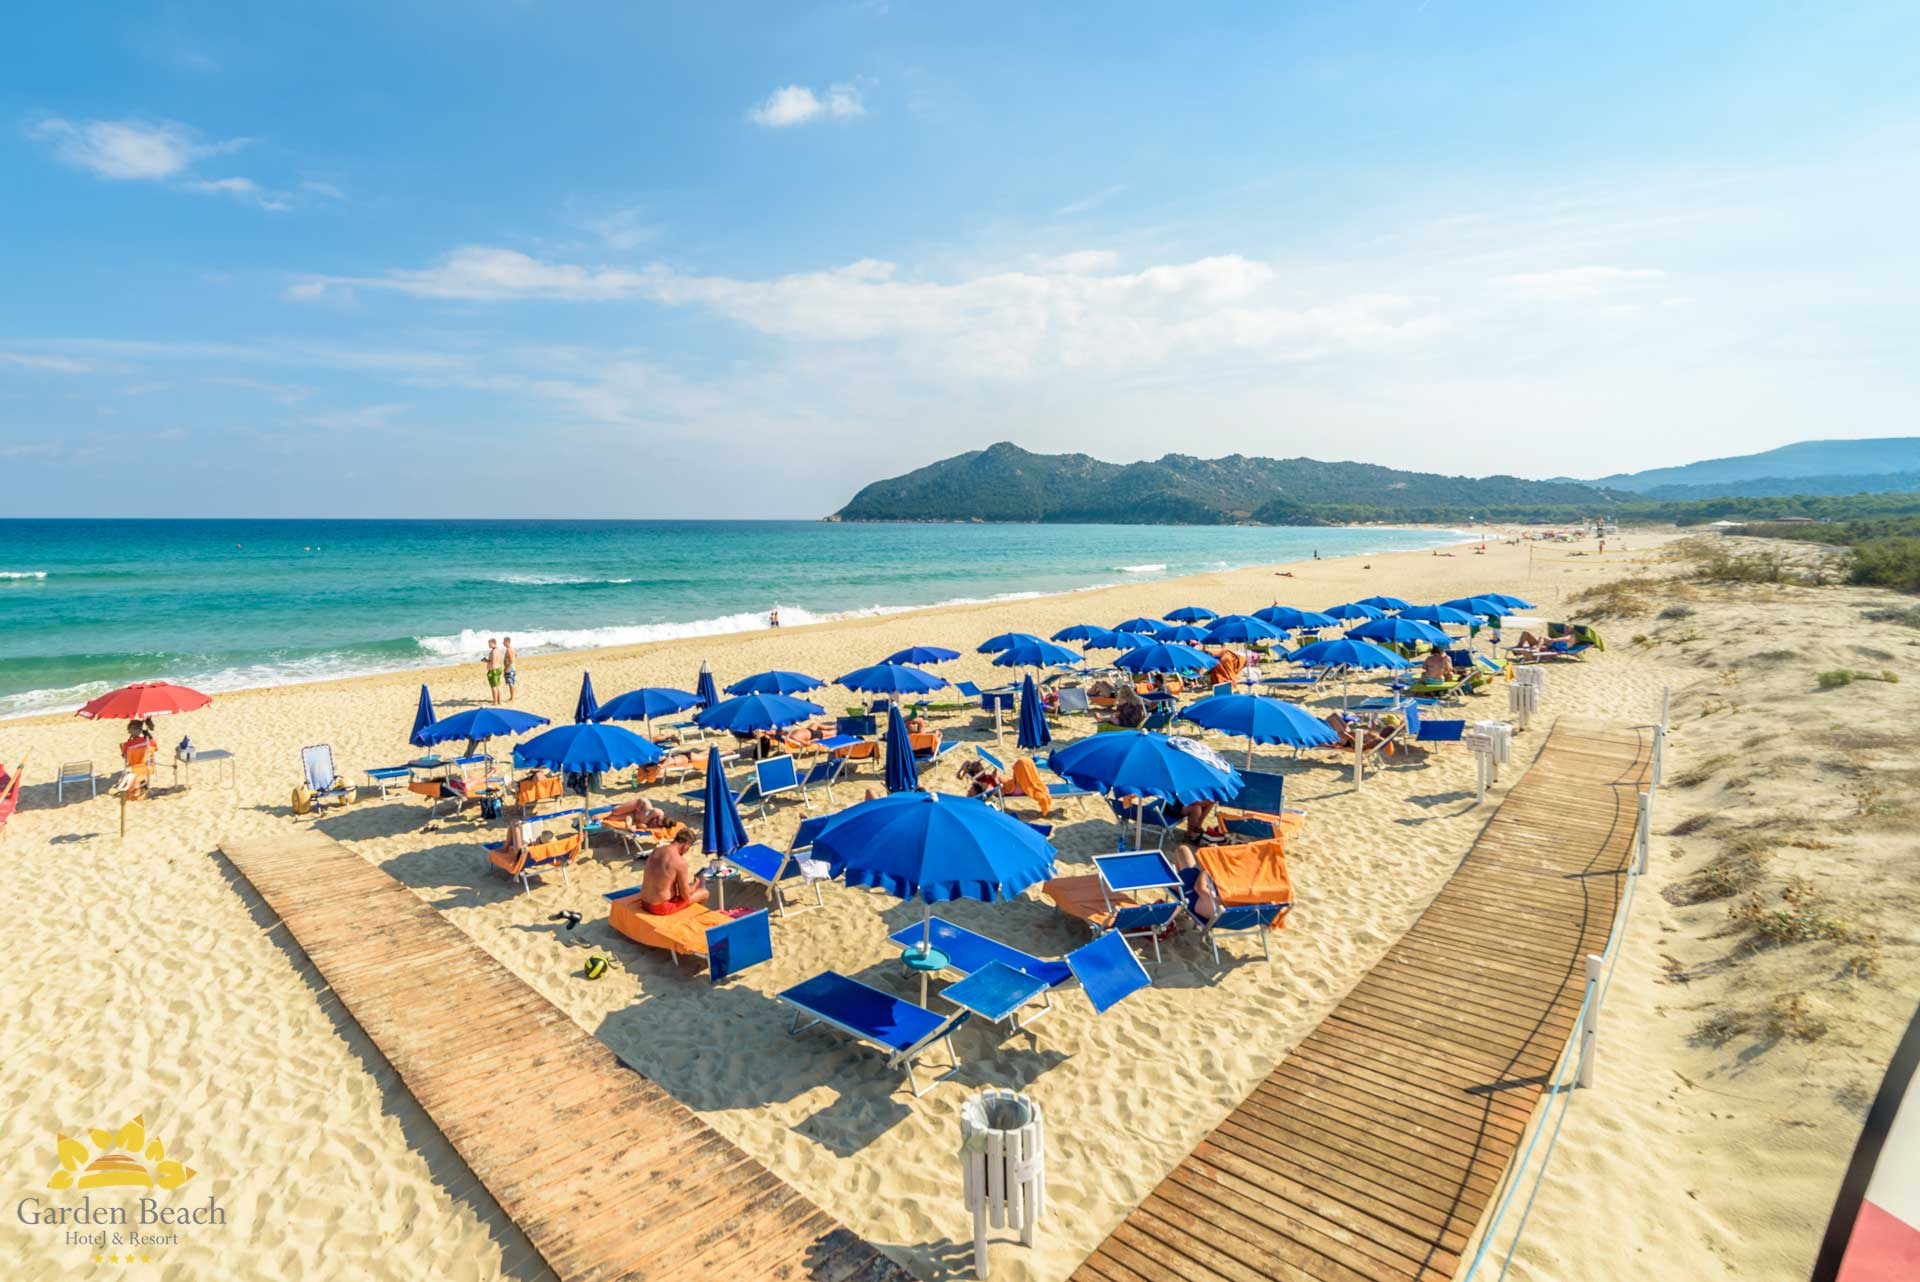 hotel-garden-beach---beach-21